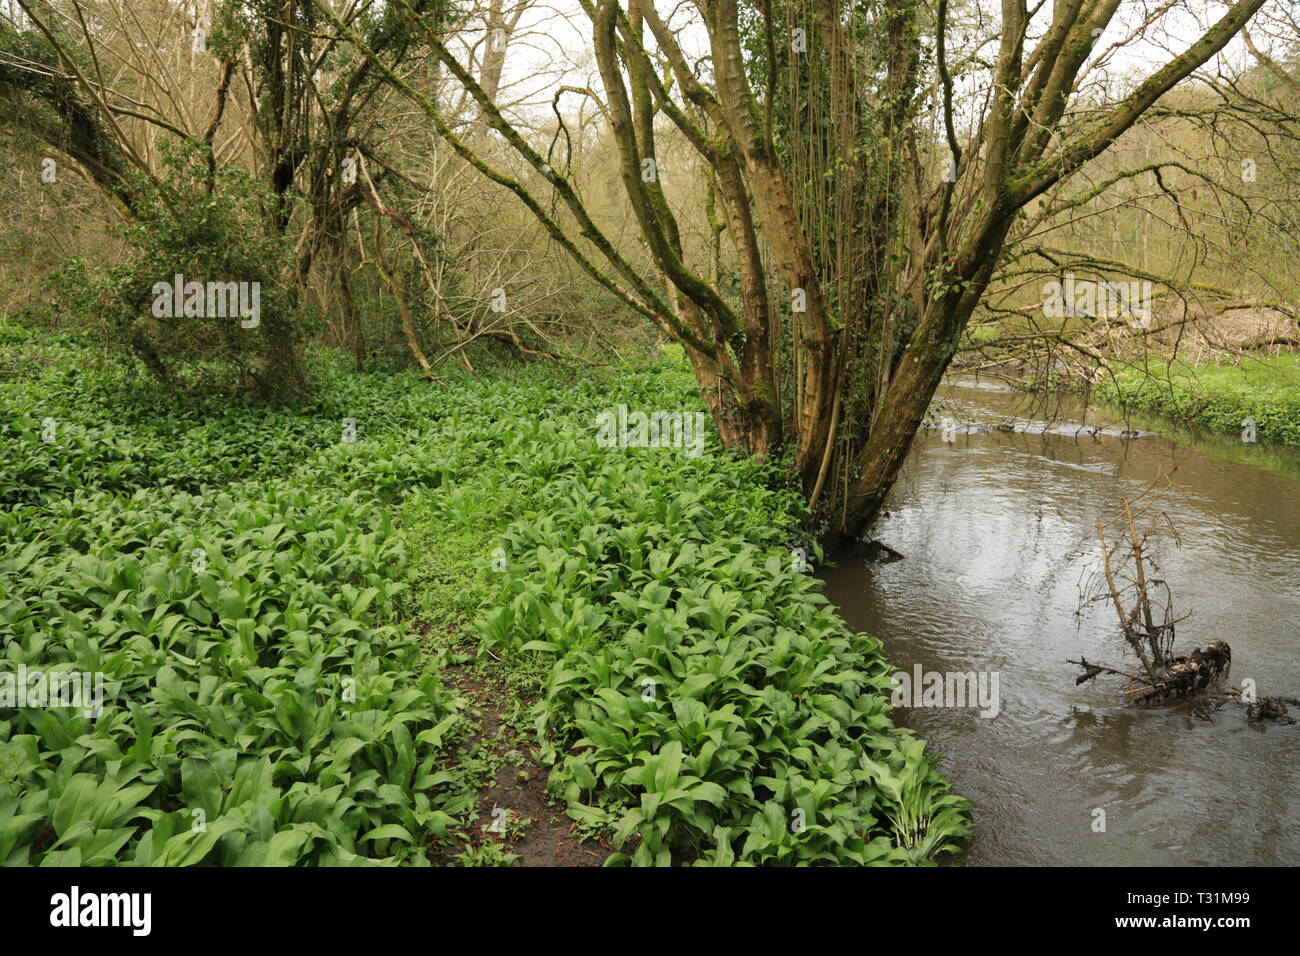 Wild Garlic (Allium ursinum) growing next to a stream in the UK. Stock Photo